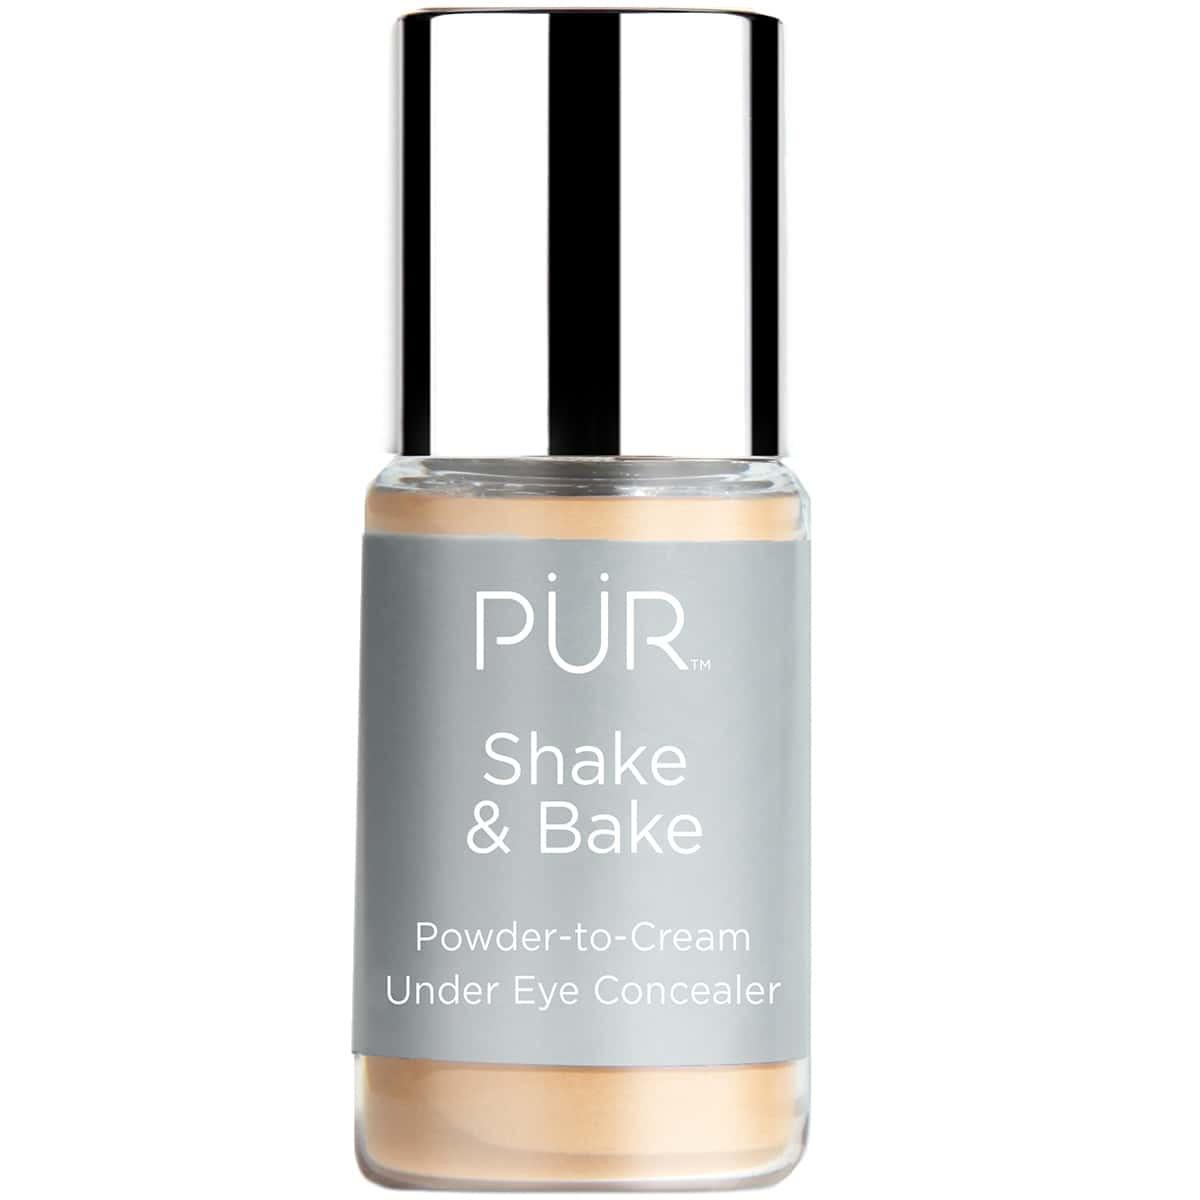 Shake & Bake Powder-to-Cream Under Eye Concealer in Medium